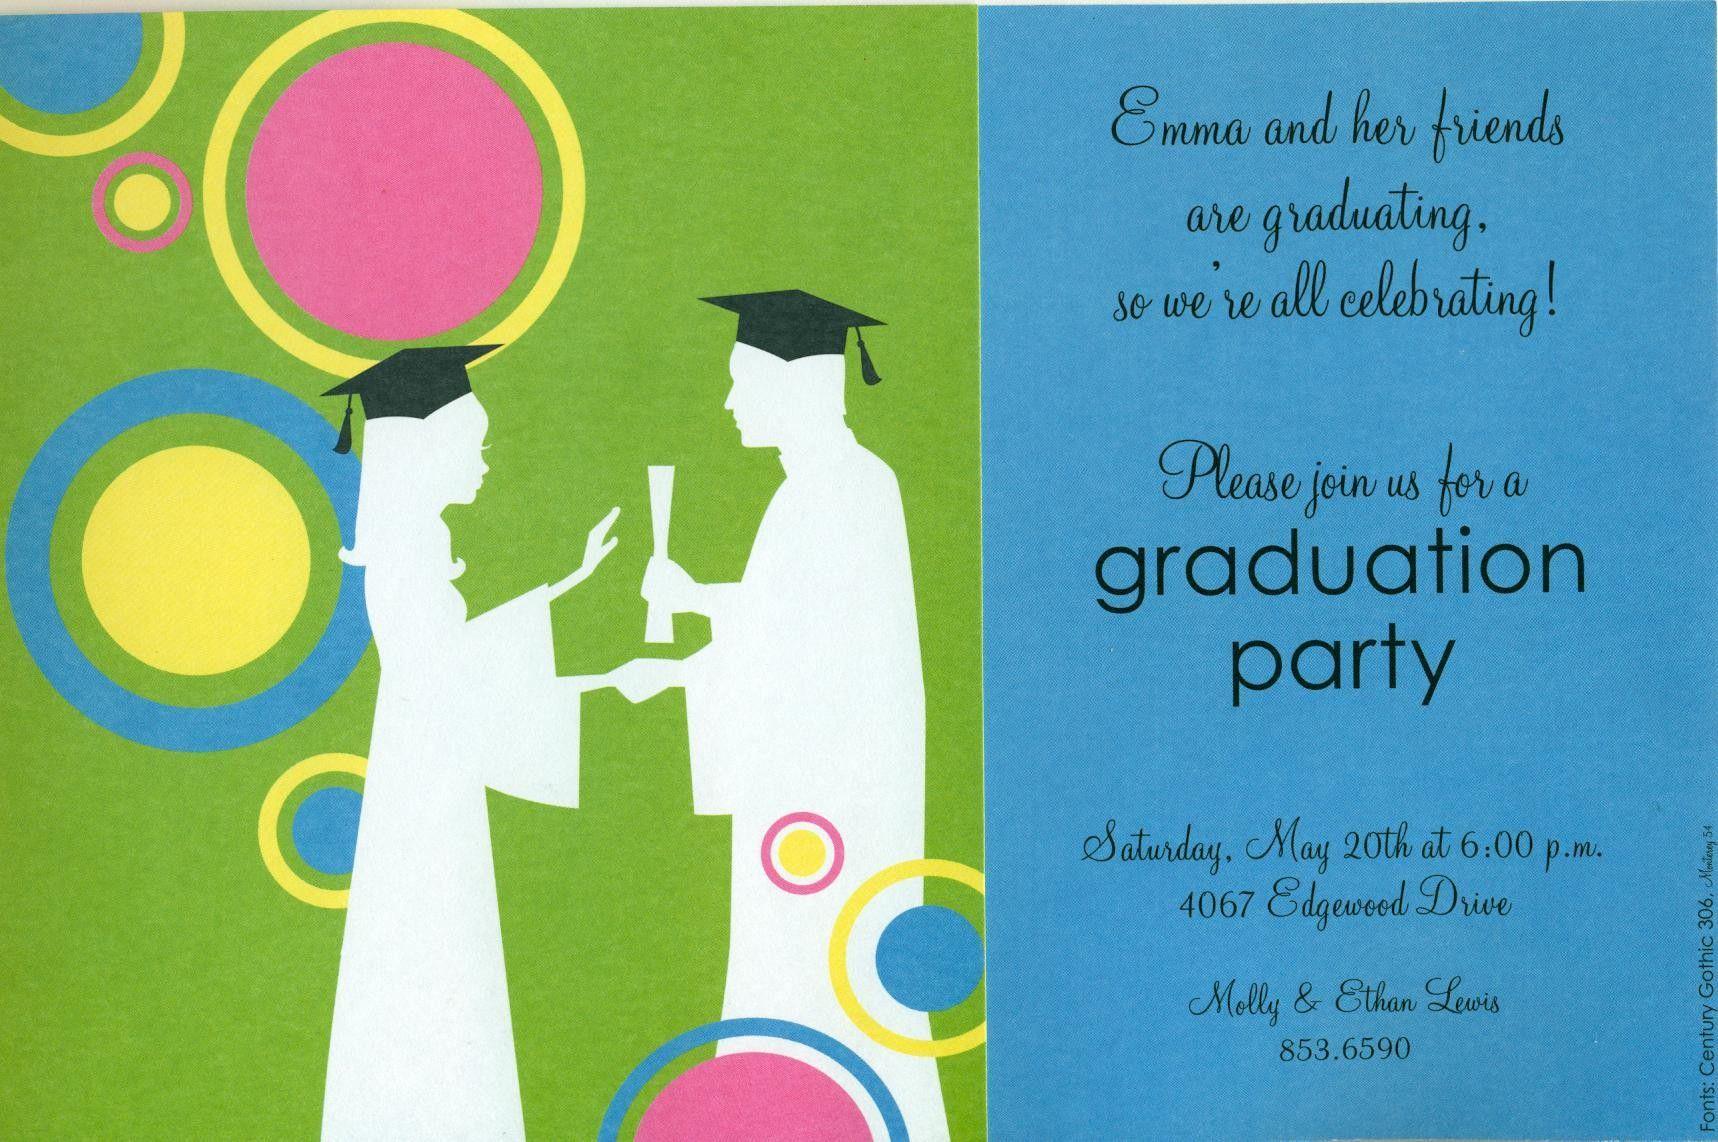 Graduation Invitation Templates Free Download   Graduation Within Graduation Party Invitation Templates Free Word